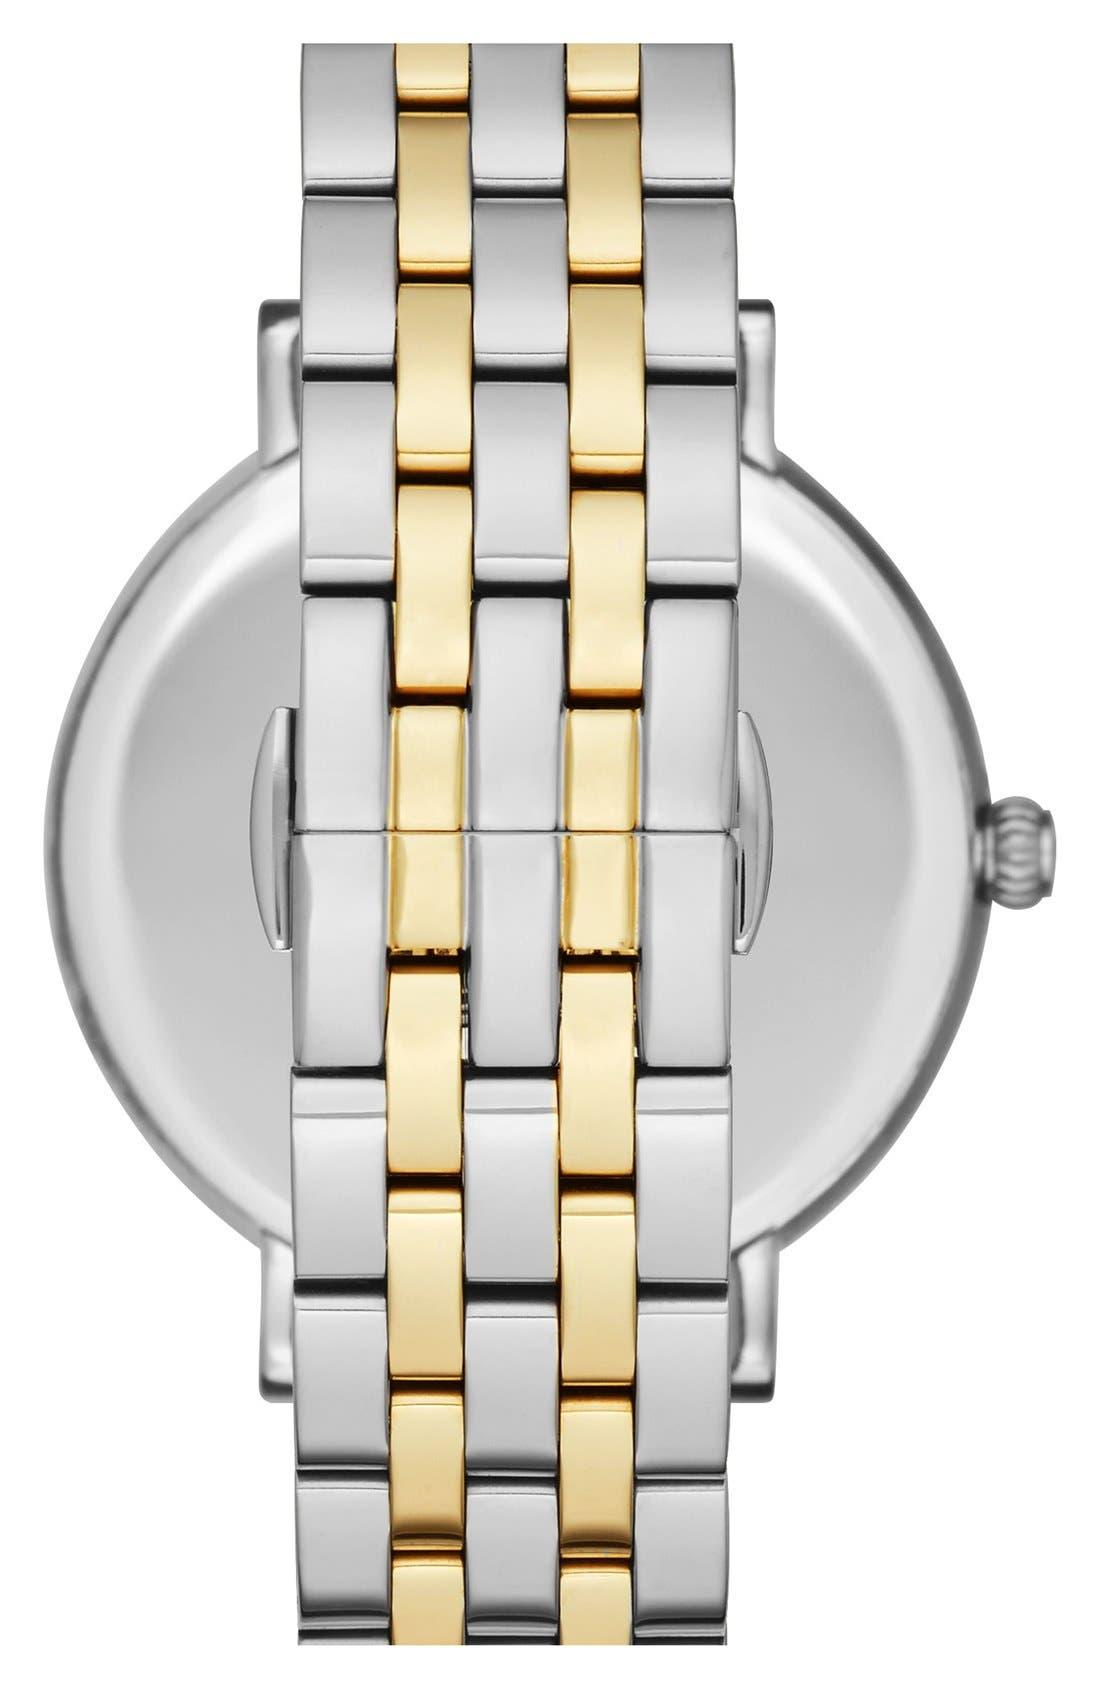 KATE SPADE NEW YORK,                             'monterey' bracelet watch, 38mm,                             Alternate thumbnail 2, color,                             040